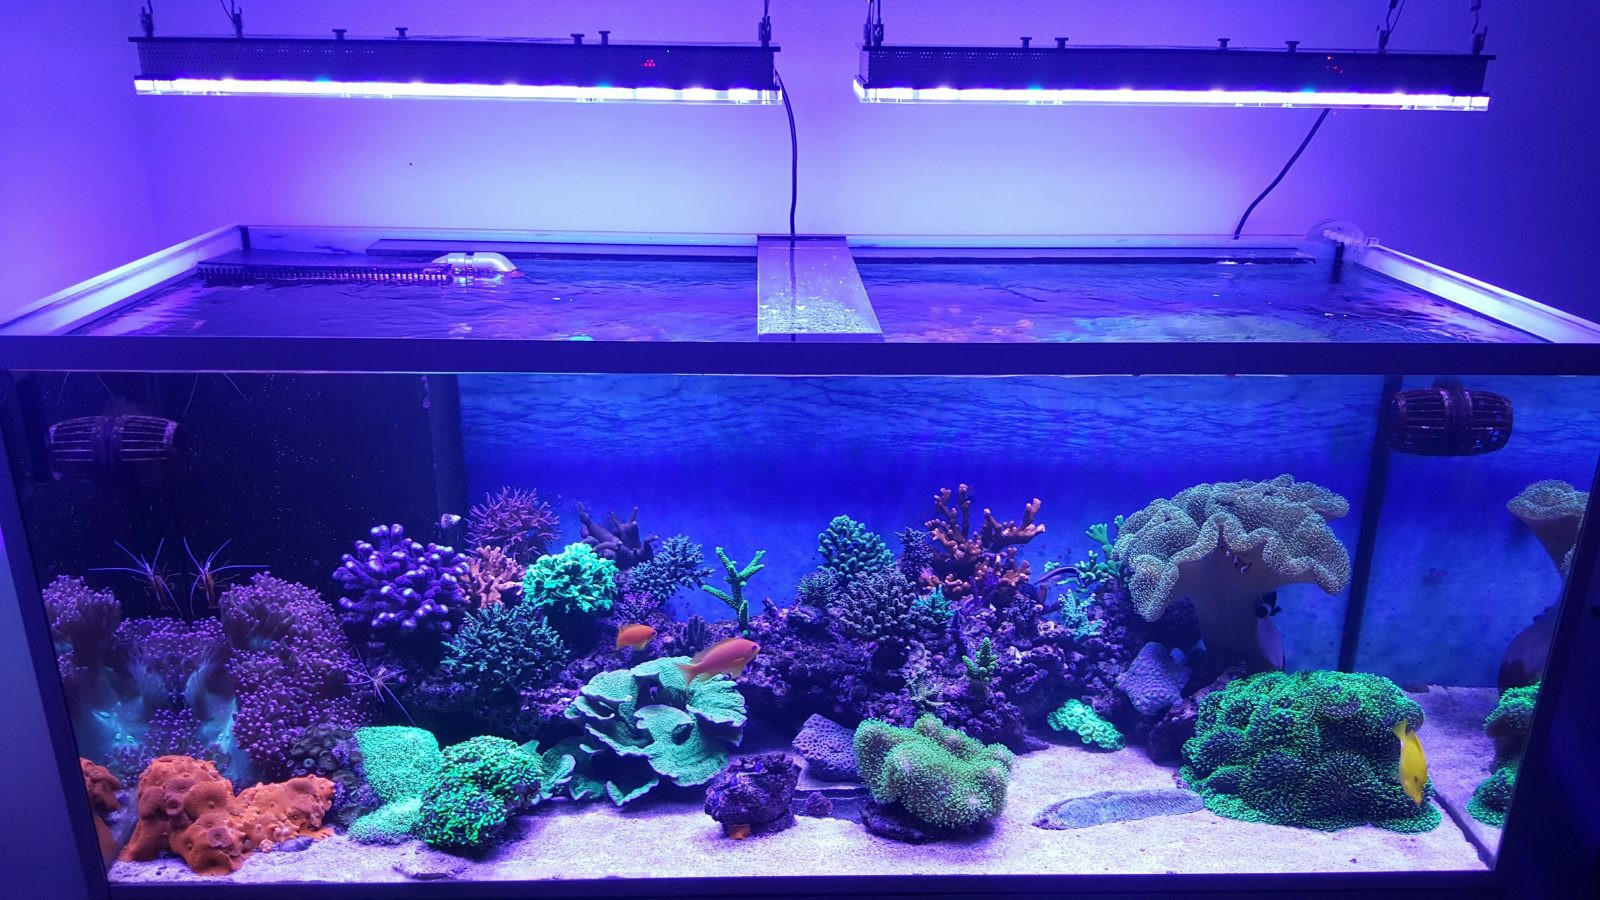 Best ideas about Led Aquarium Lights . Save or Pin What Aquarium LED lights do I chose for my aquarium •Orphek Now.